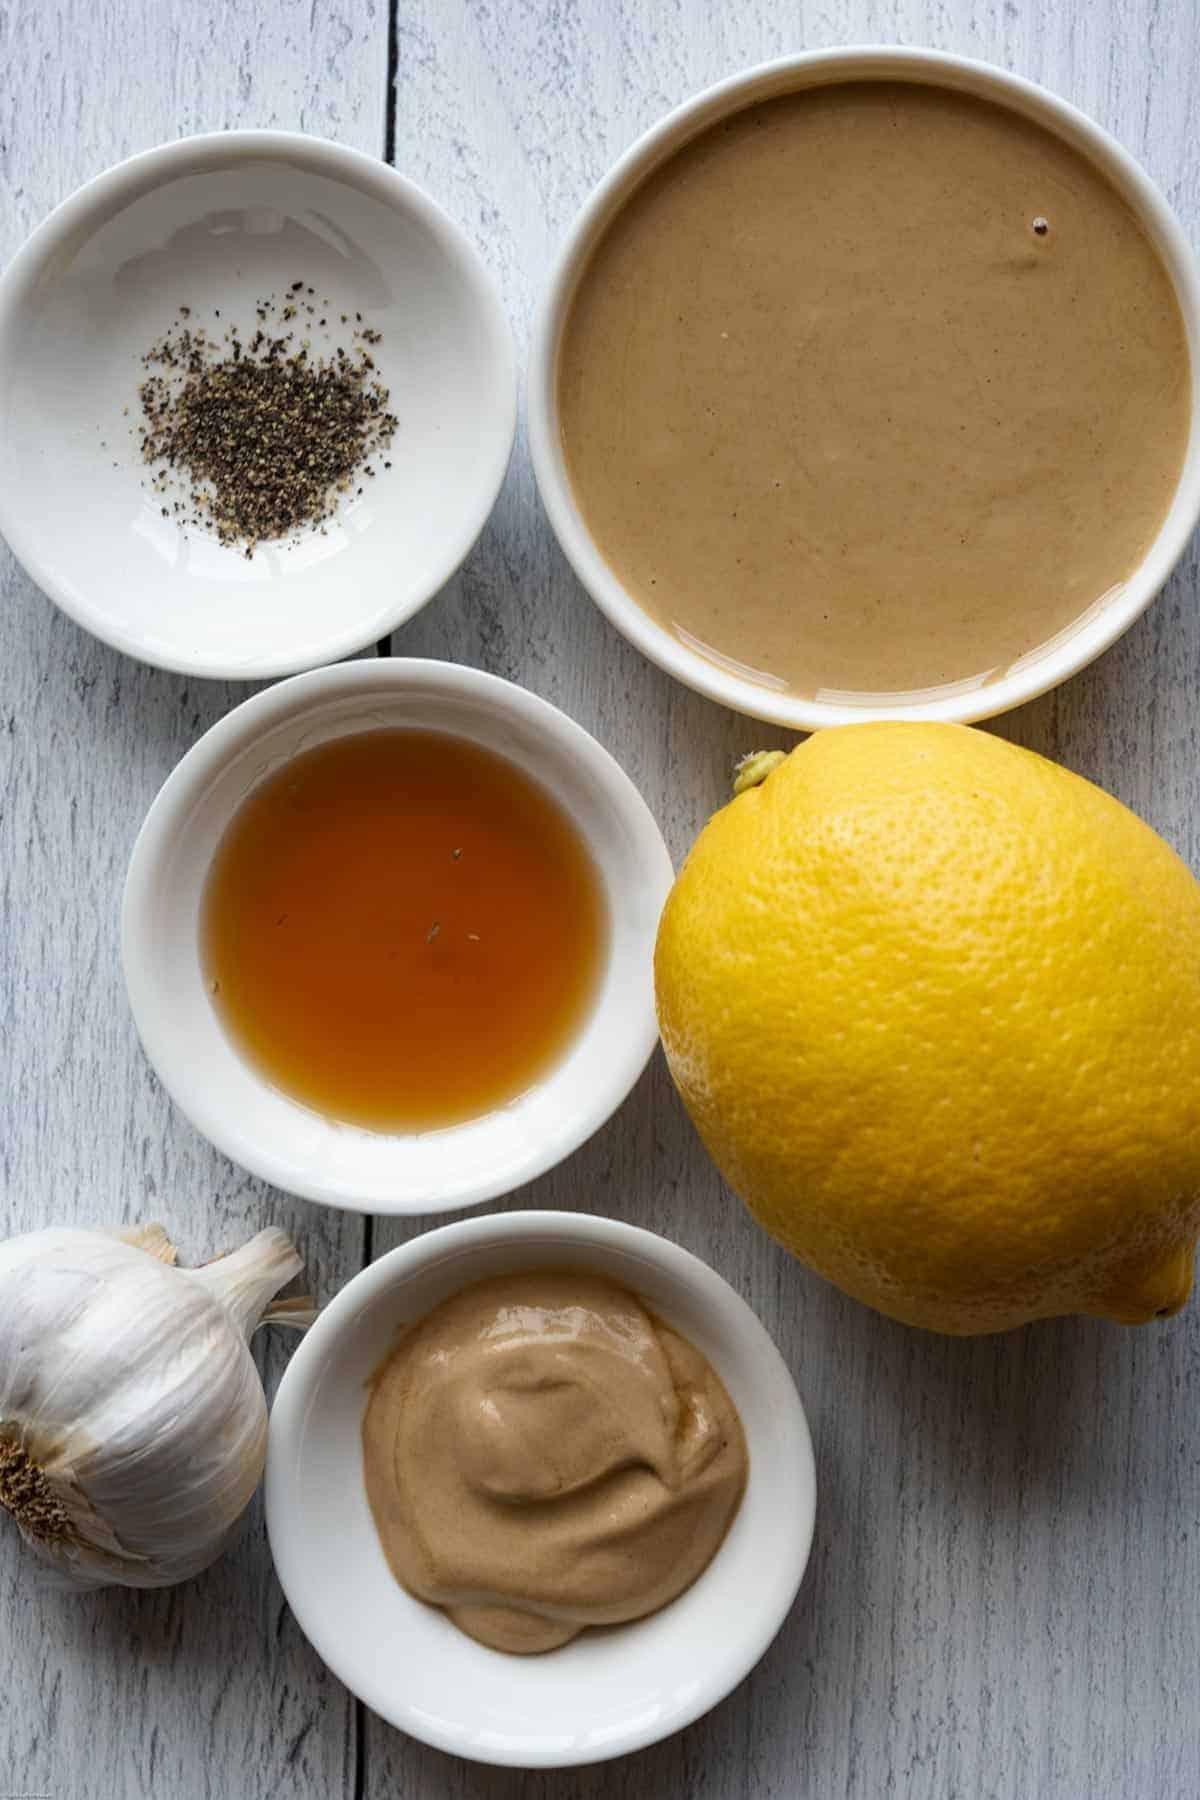 Tahini Dressing Ingredients: tahini, garlic, lemon, maple syrup, black pepper, and Dijon mustard.